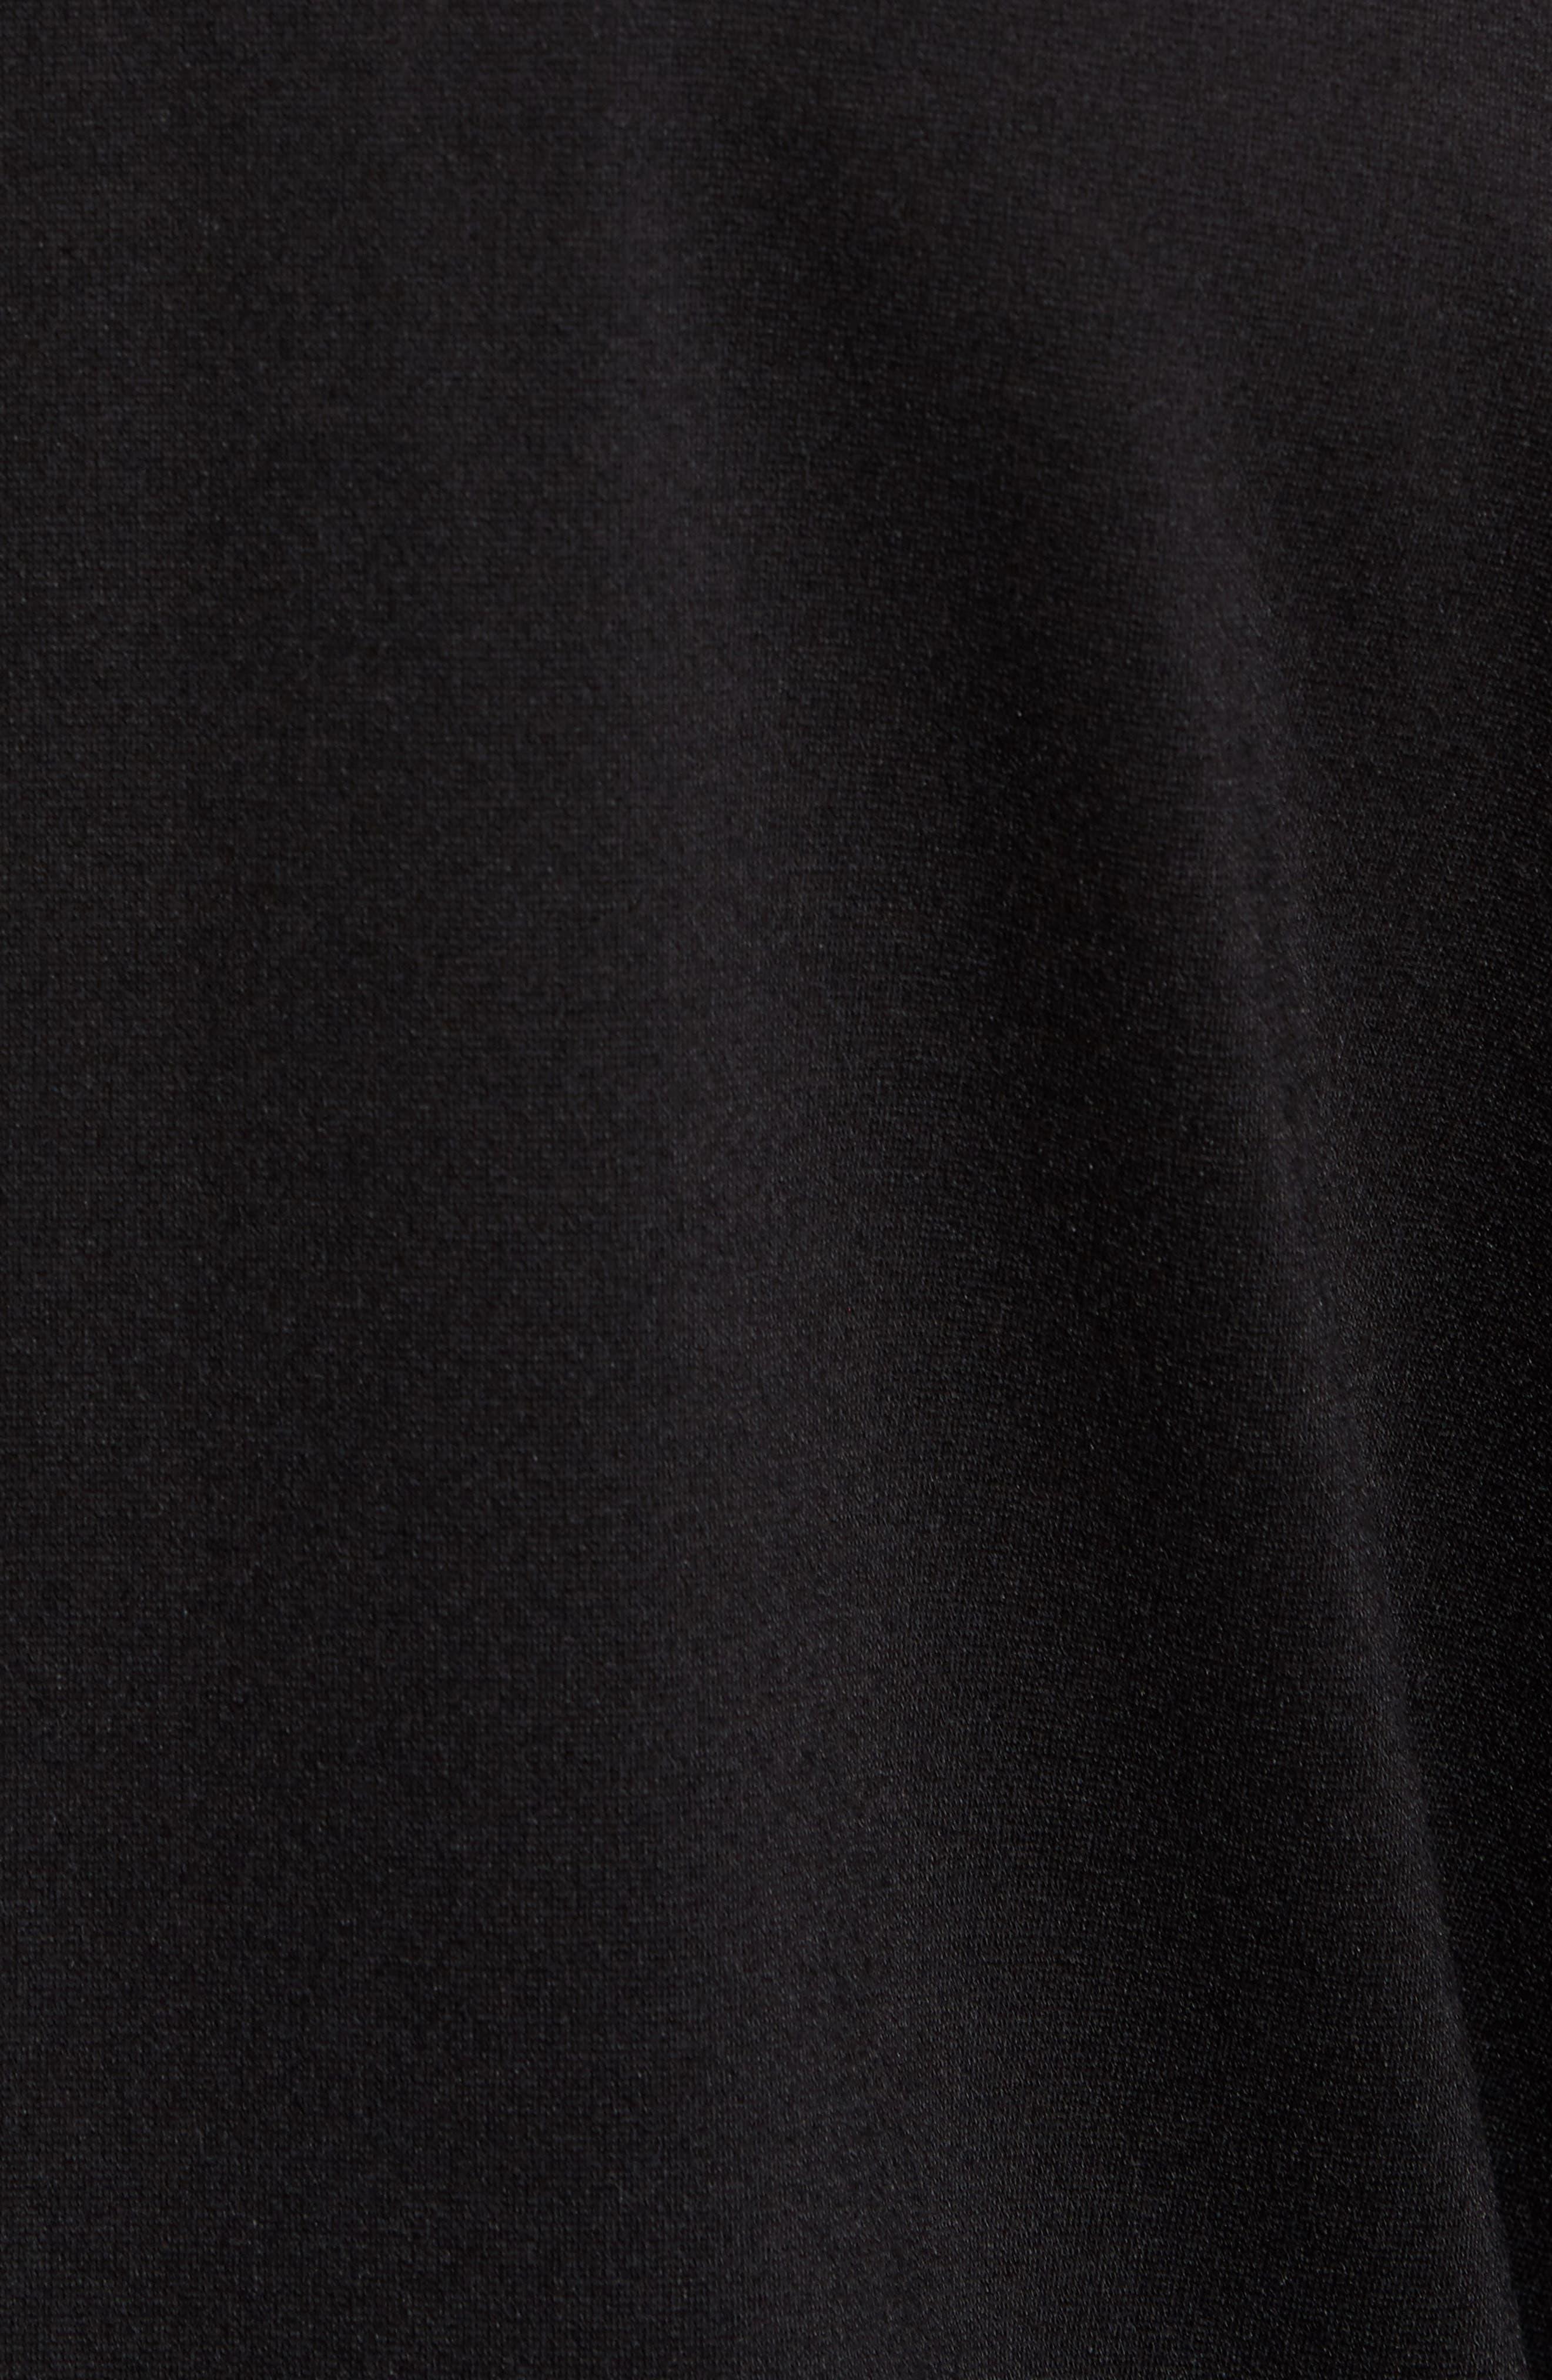 Hugo Boss Babenu Shirt Jacket,                             Alternate thumbnail 6, color,